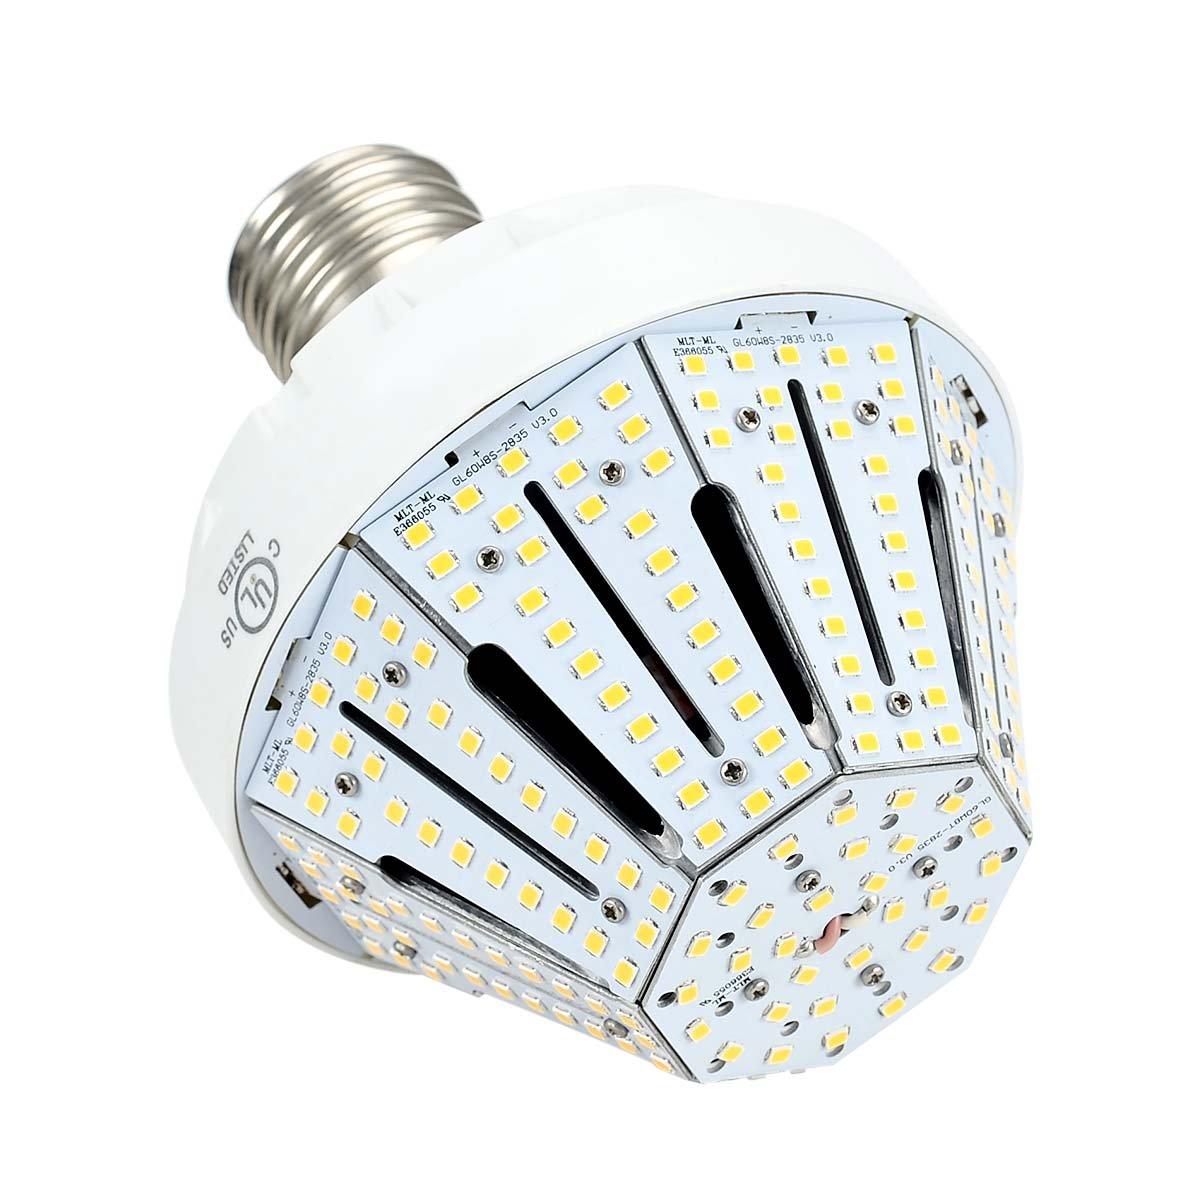 Phenas Garden Light LED Corn Bulb 60W (400-600 Watt Replacement), LED Street Light/Garden Lamp/Parking Lot, E39 Large Mogul Screw Base, 6000K Area Light, 360° Flood Light, UL-Listed, DLC-Qualified